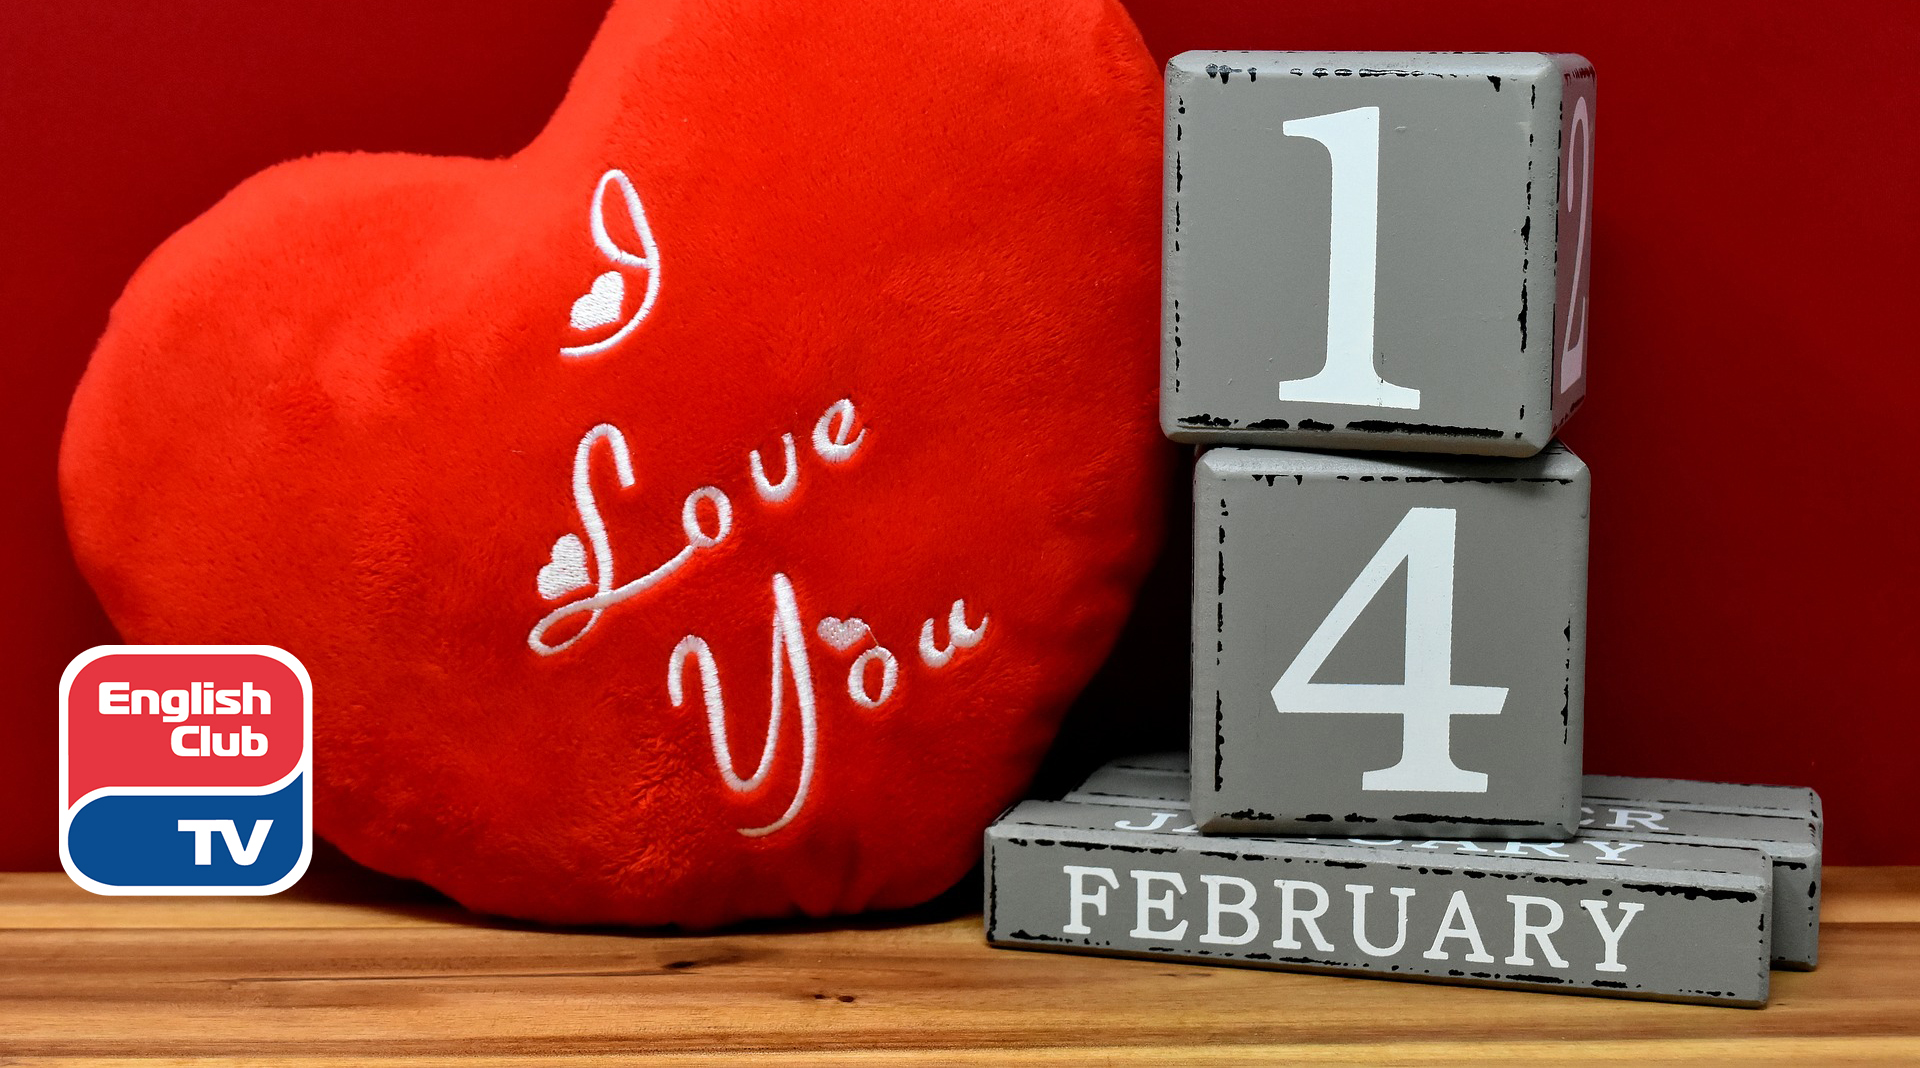 valentines7777-day-3133473_1920